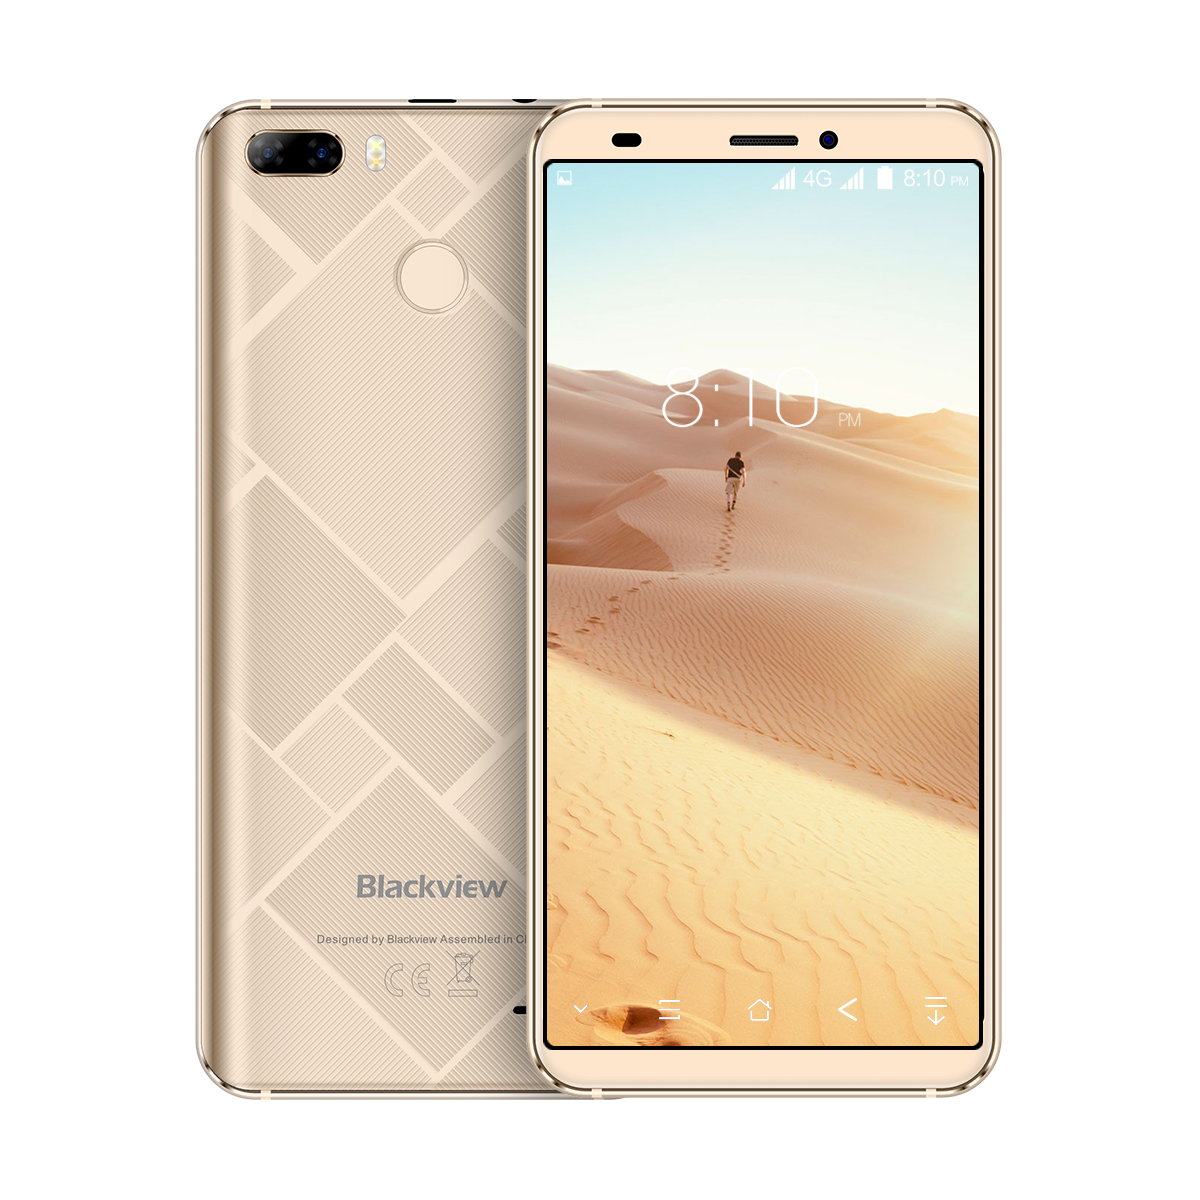 Original Blackview S6 Celular 5.7 polegada 18:9 HD + Sceen Completo 2 GB + 16 GB MT6737VWH Quad Core android 7.0 Dual Cams Traseira Sma